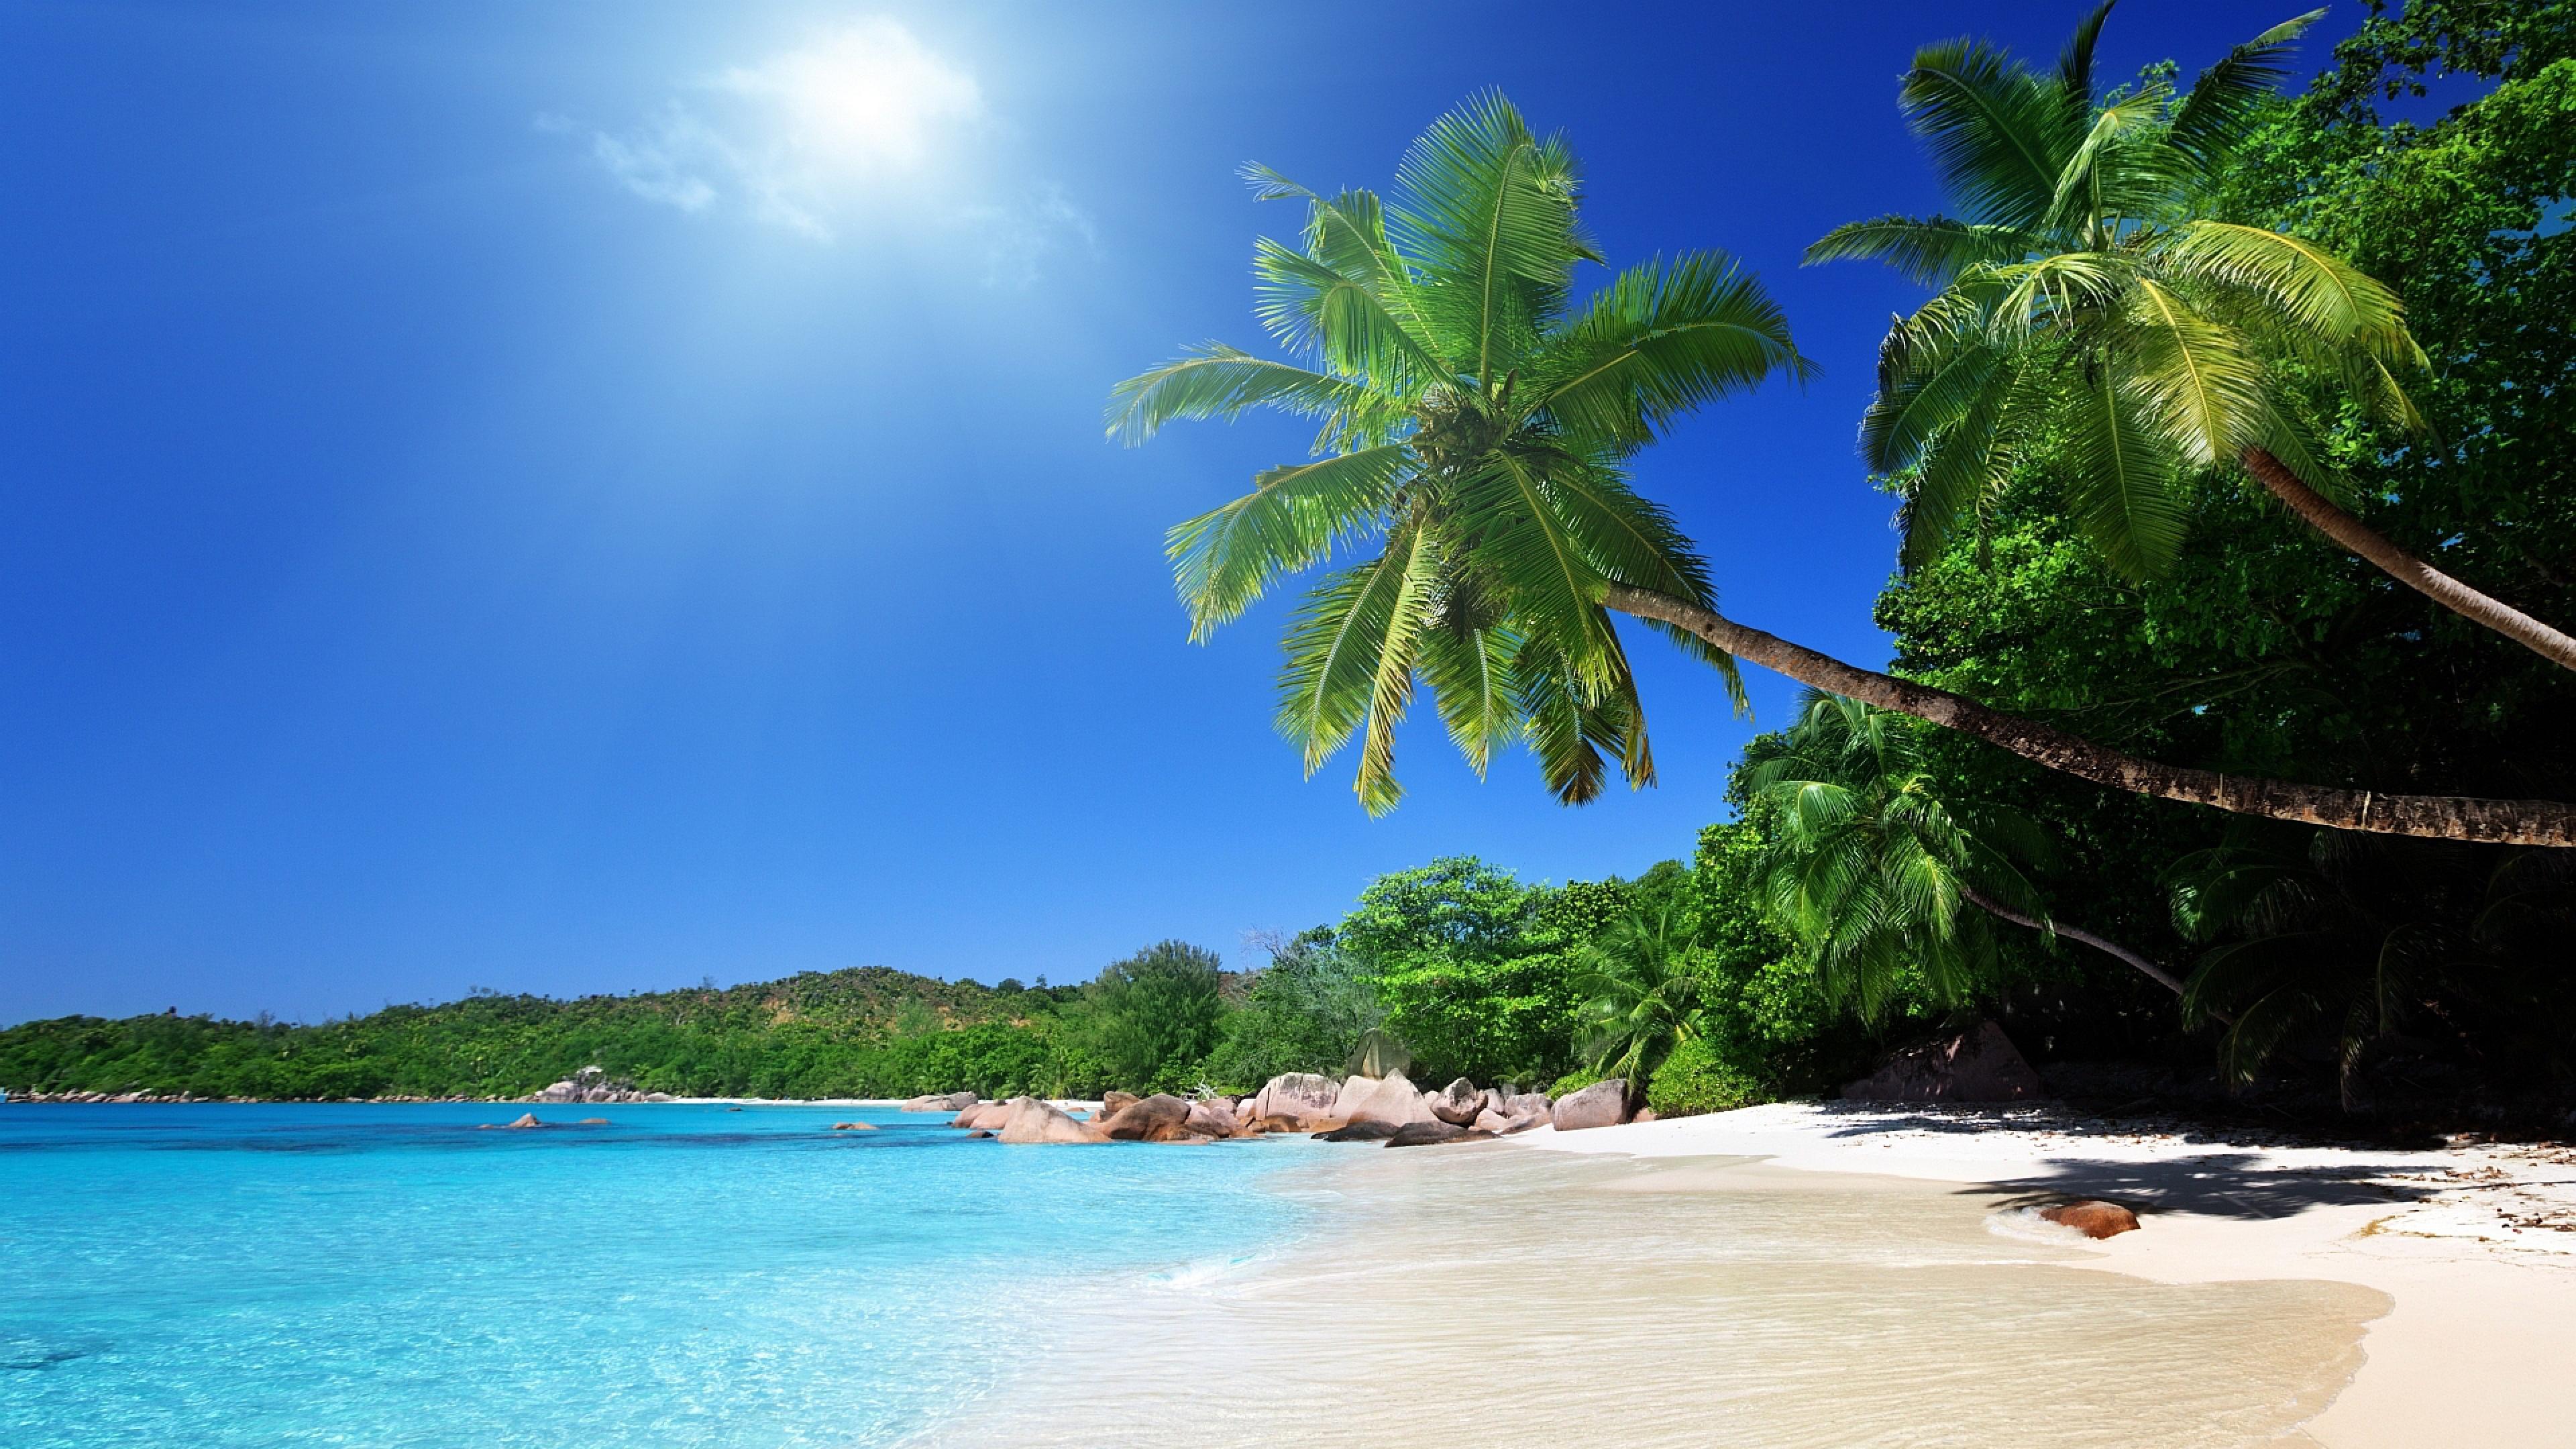 берег камни пальмы shore stones palm trees  № 792084 бесплатно